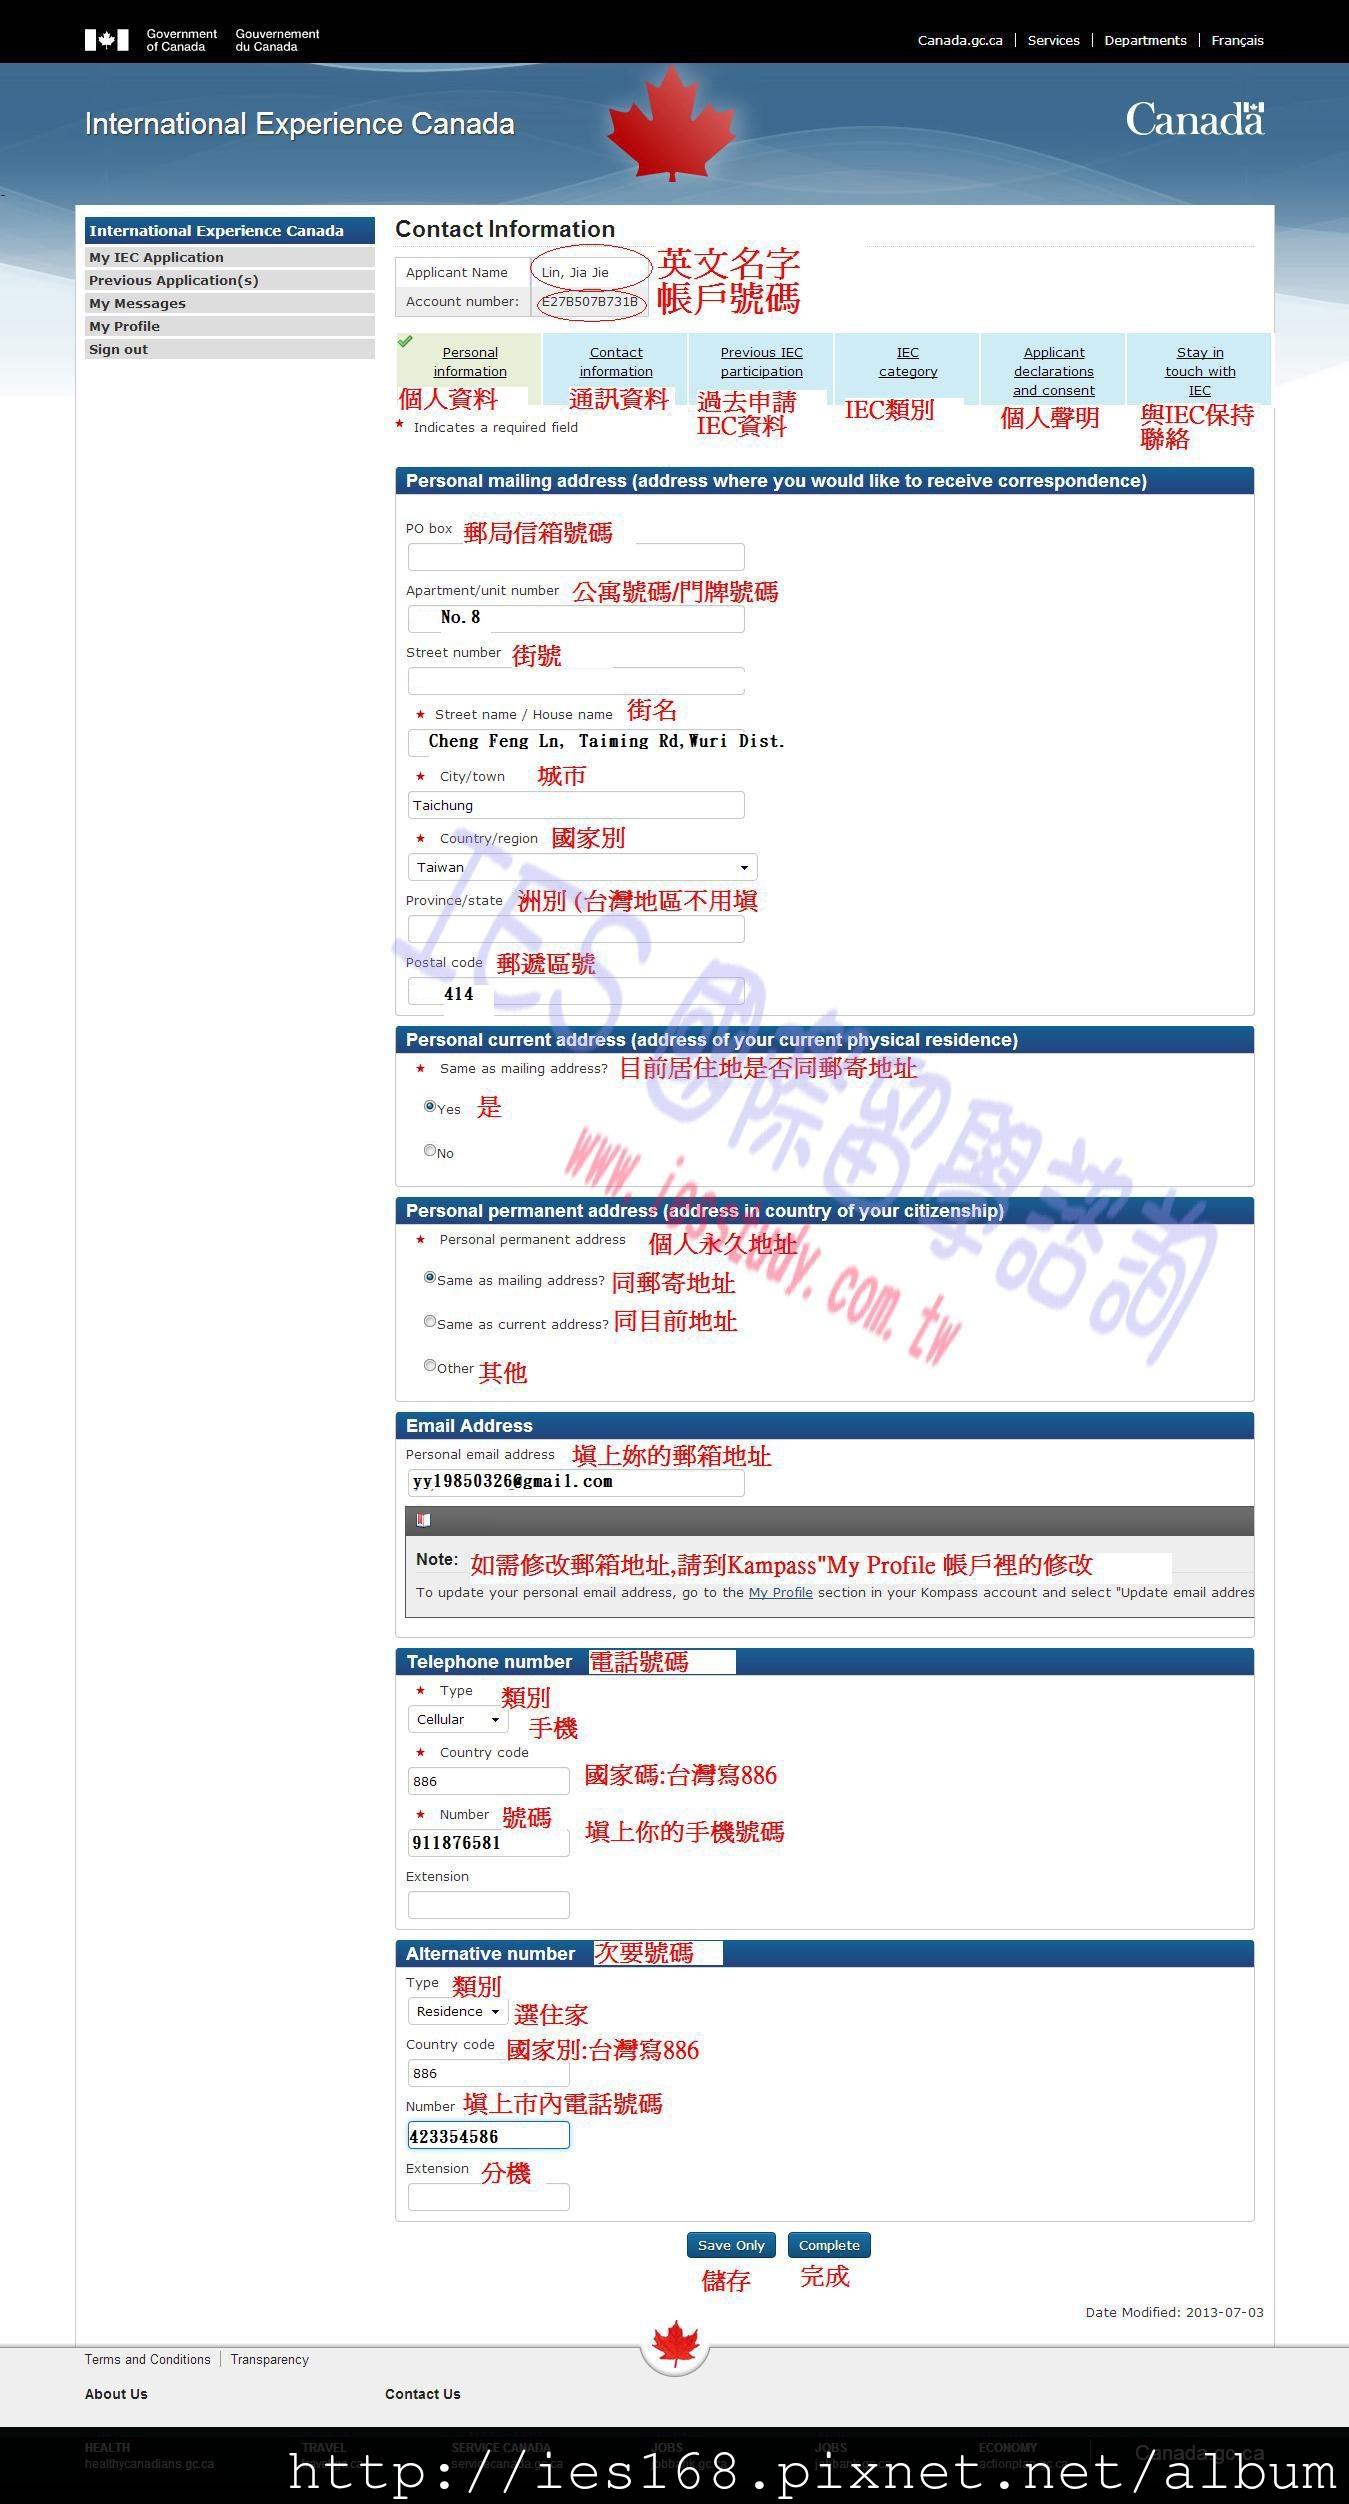 IEC contact info